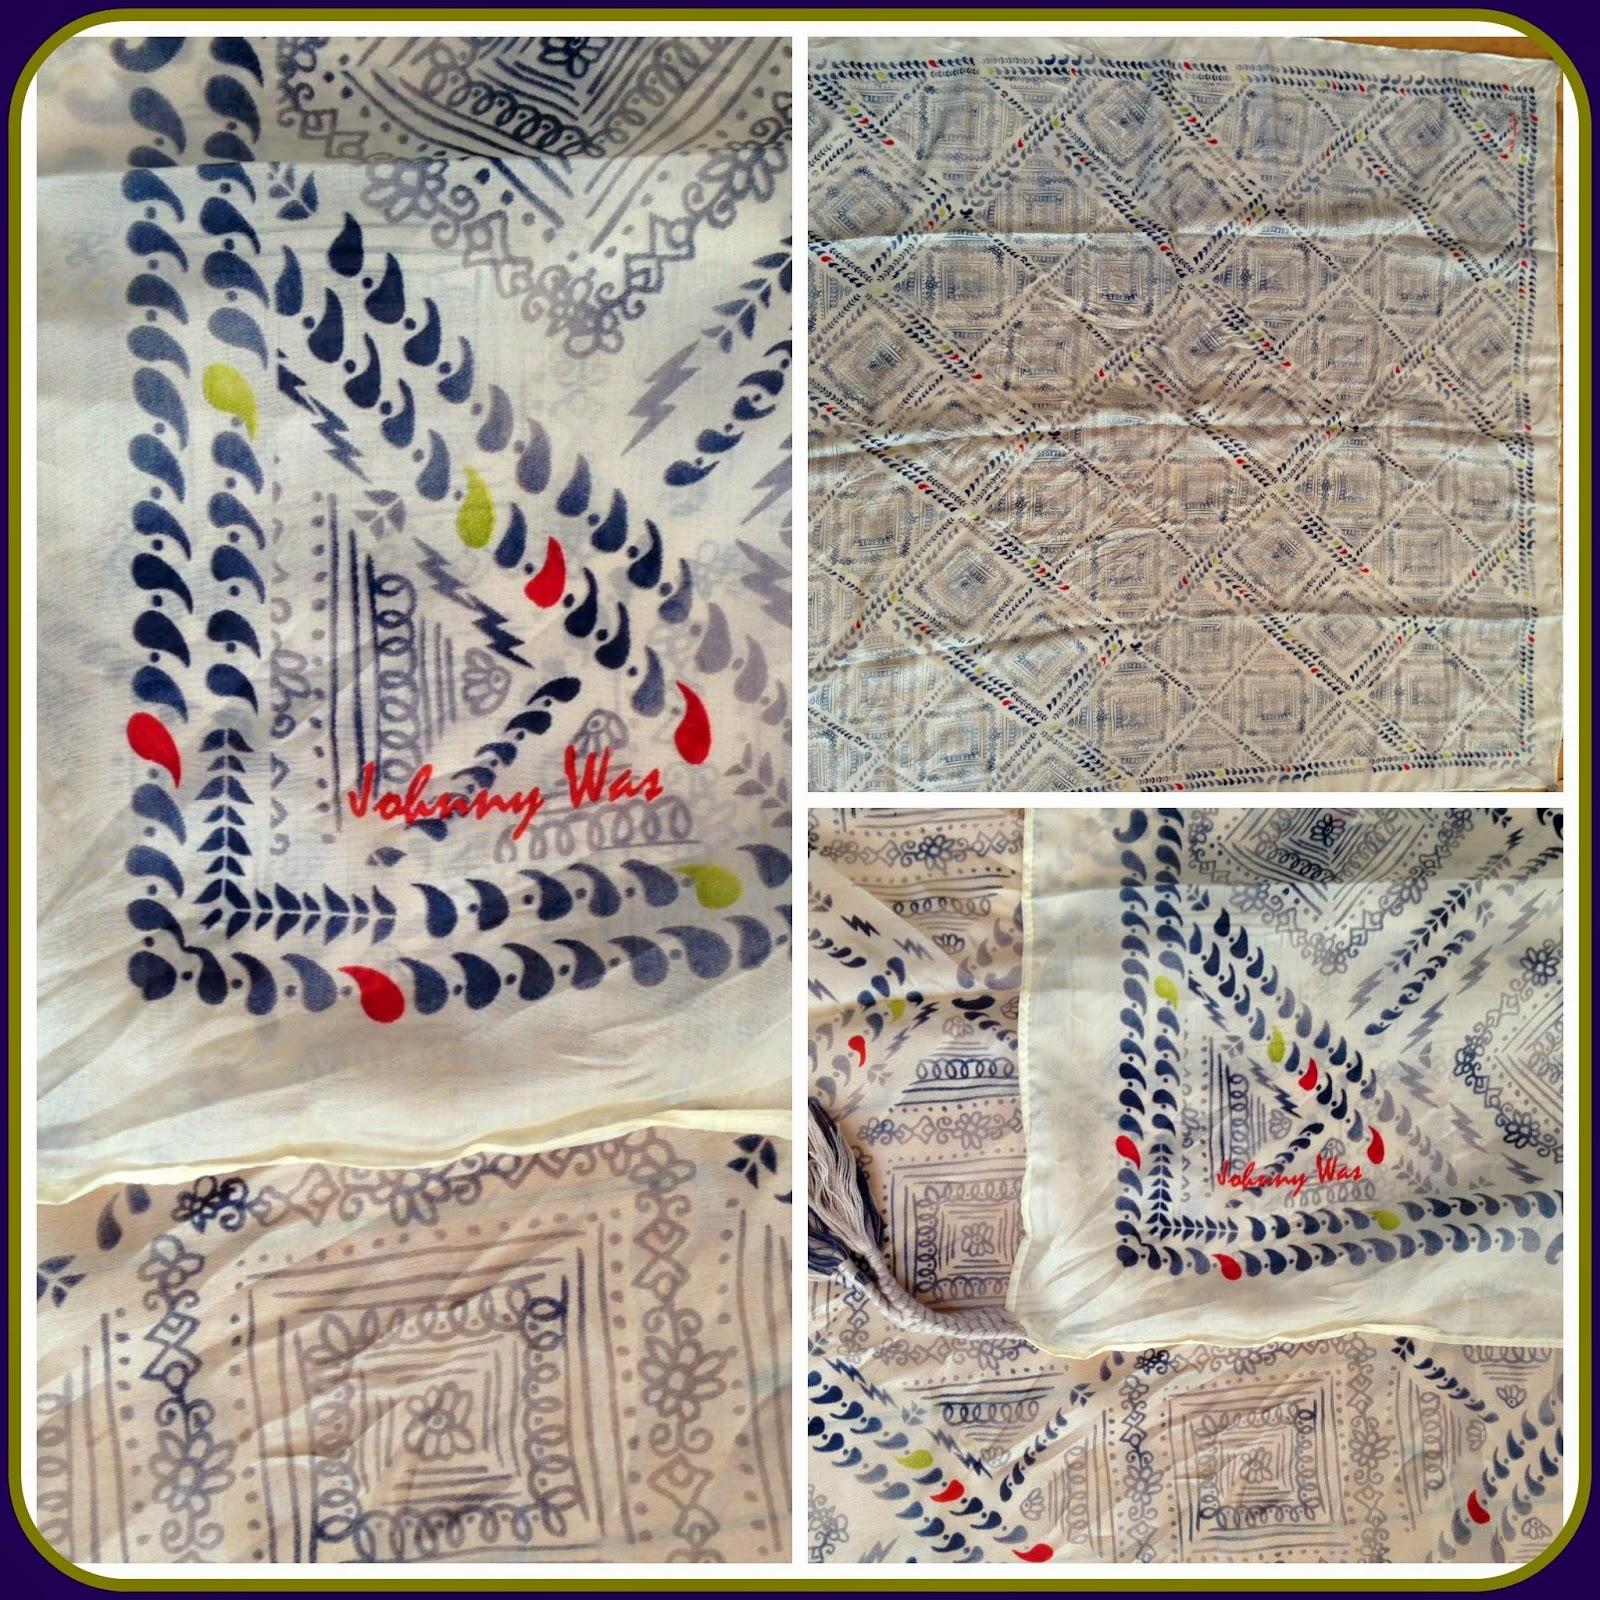 Mini Checker Silk Scarf by Johnny Was ($88)